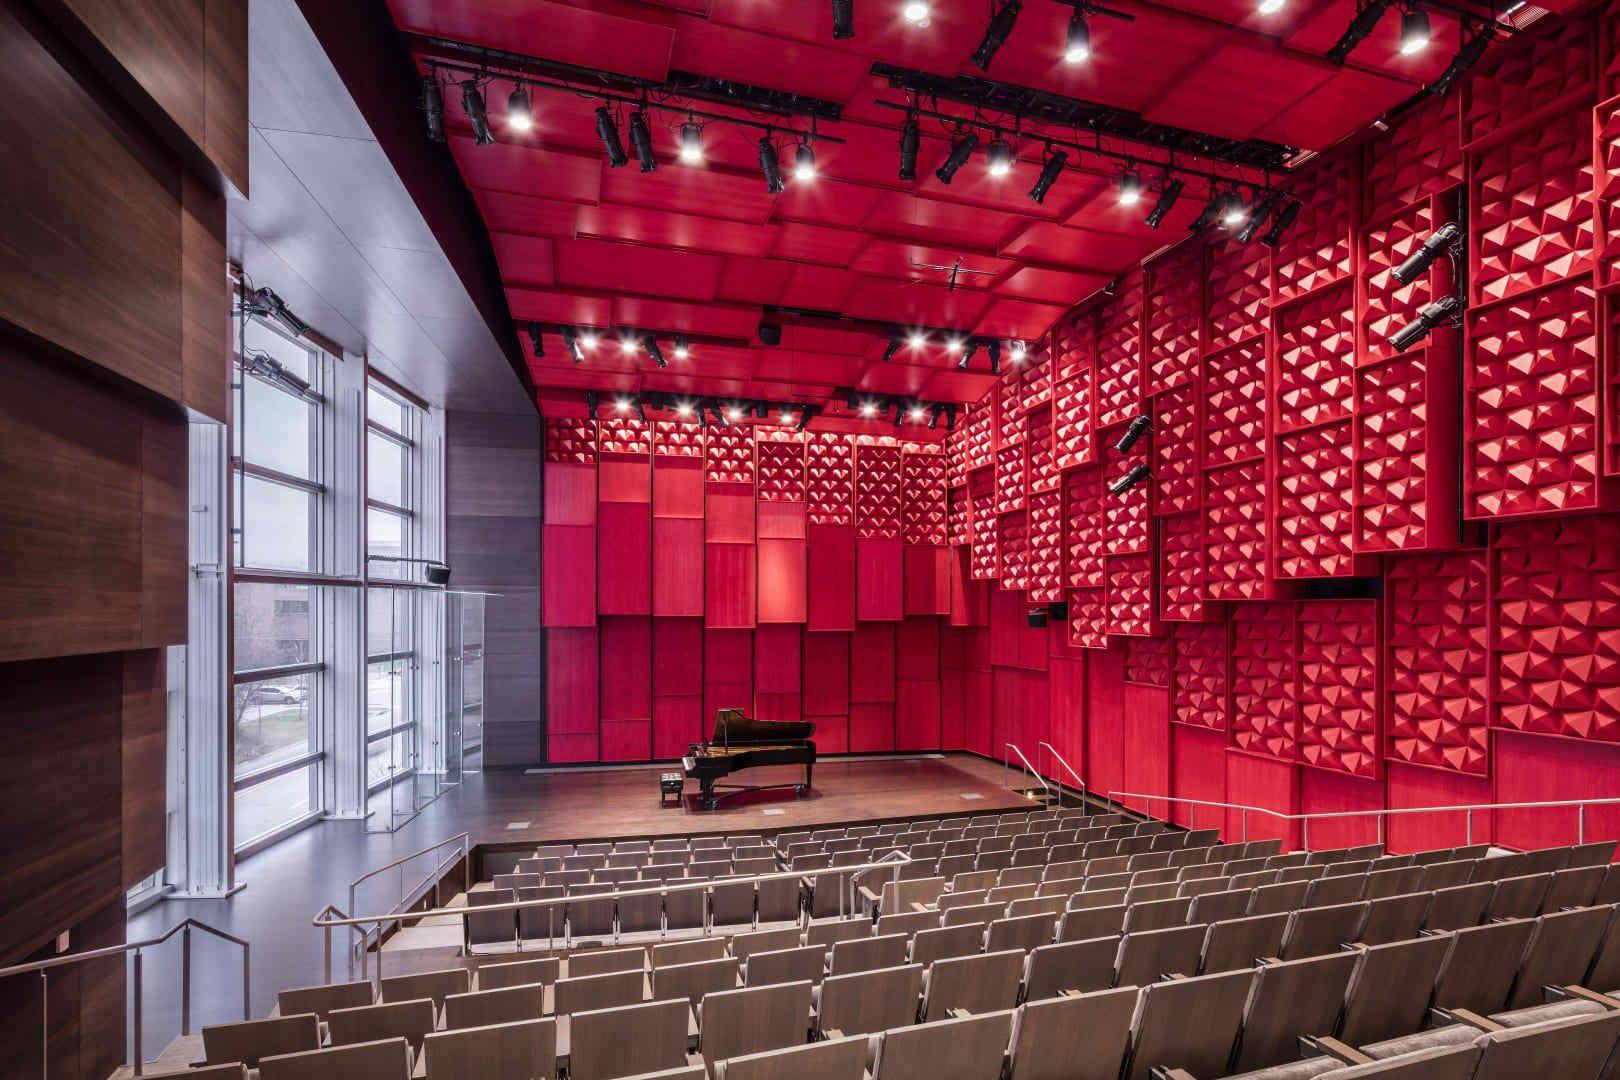 Aia Announces 2020 Interior Architecture Award Winners 2020